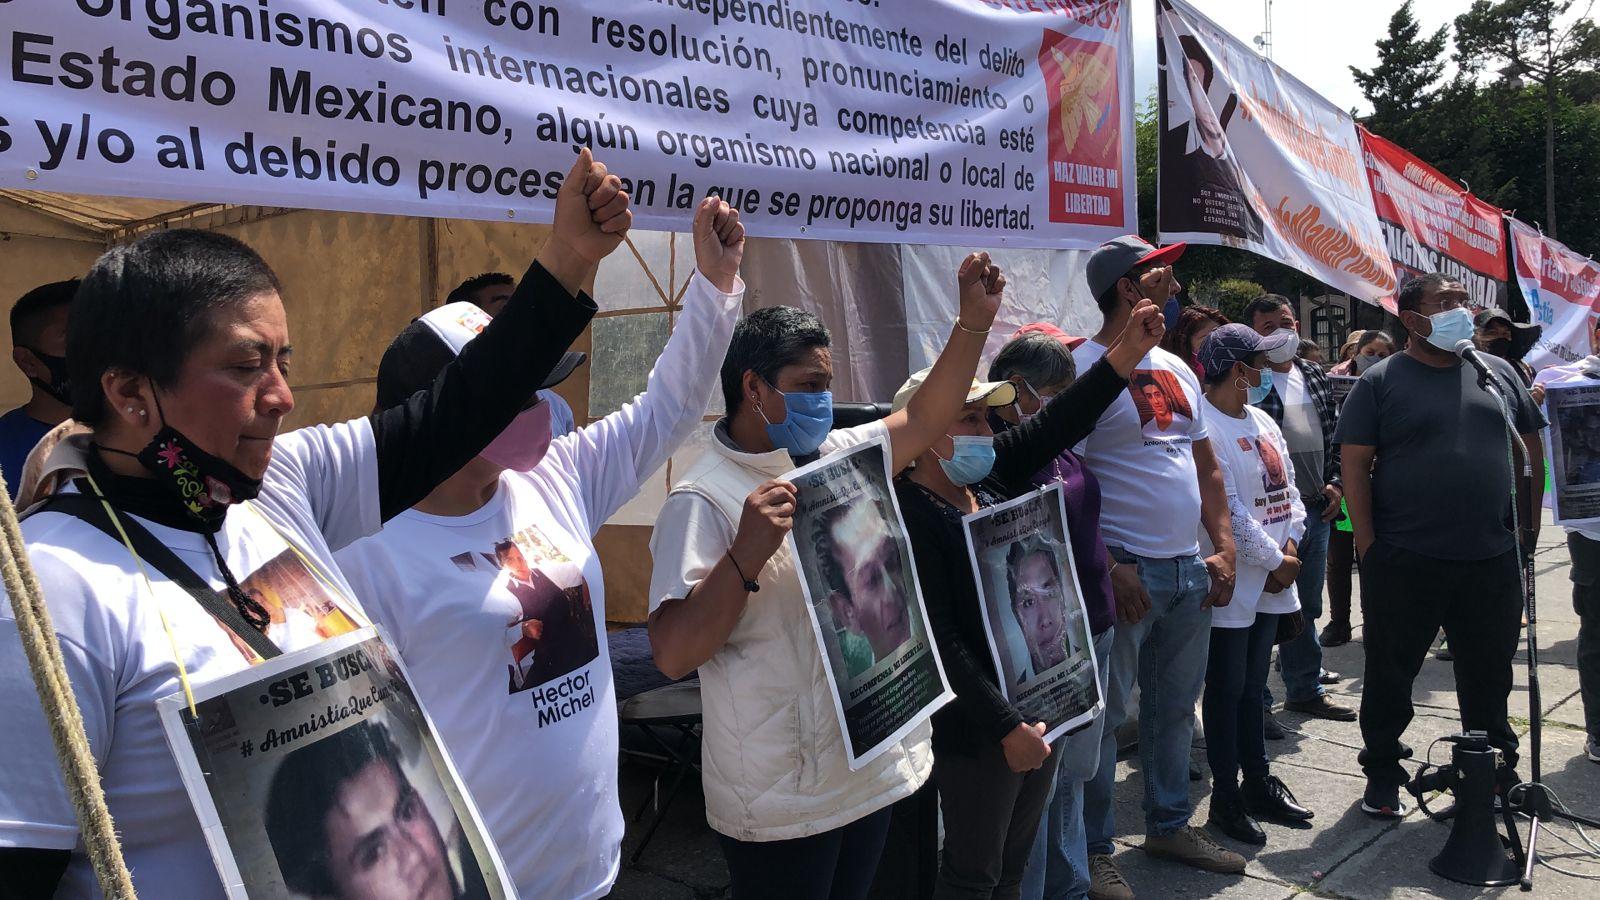 Piden liberación de presuntos inocentes con huelga de hambre